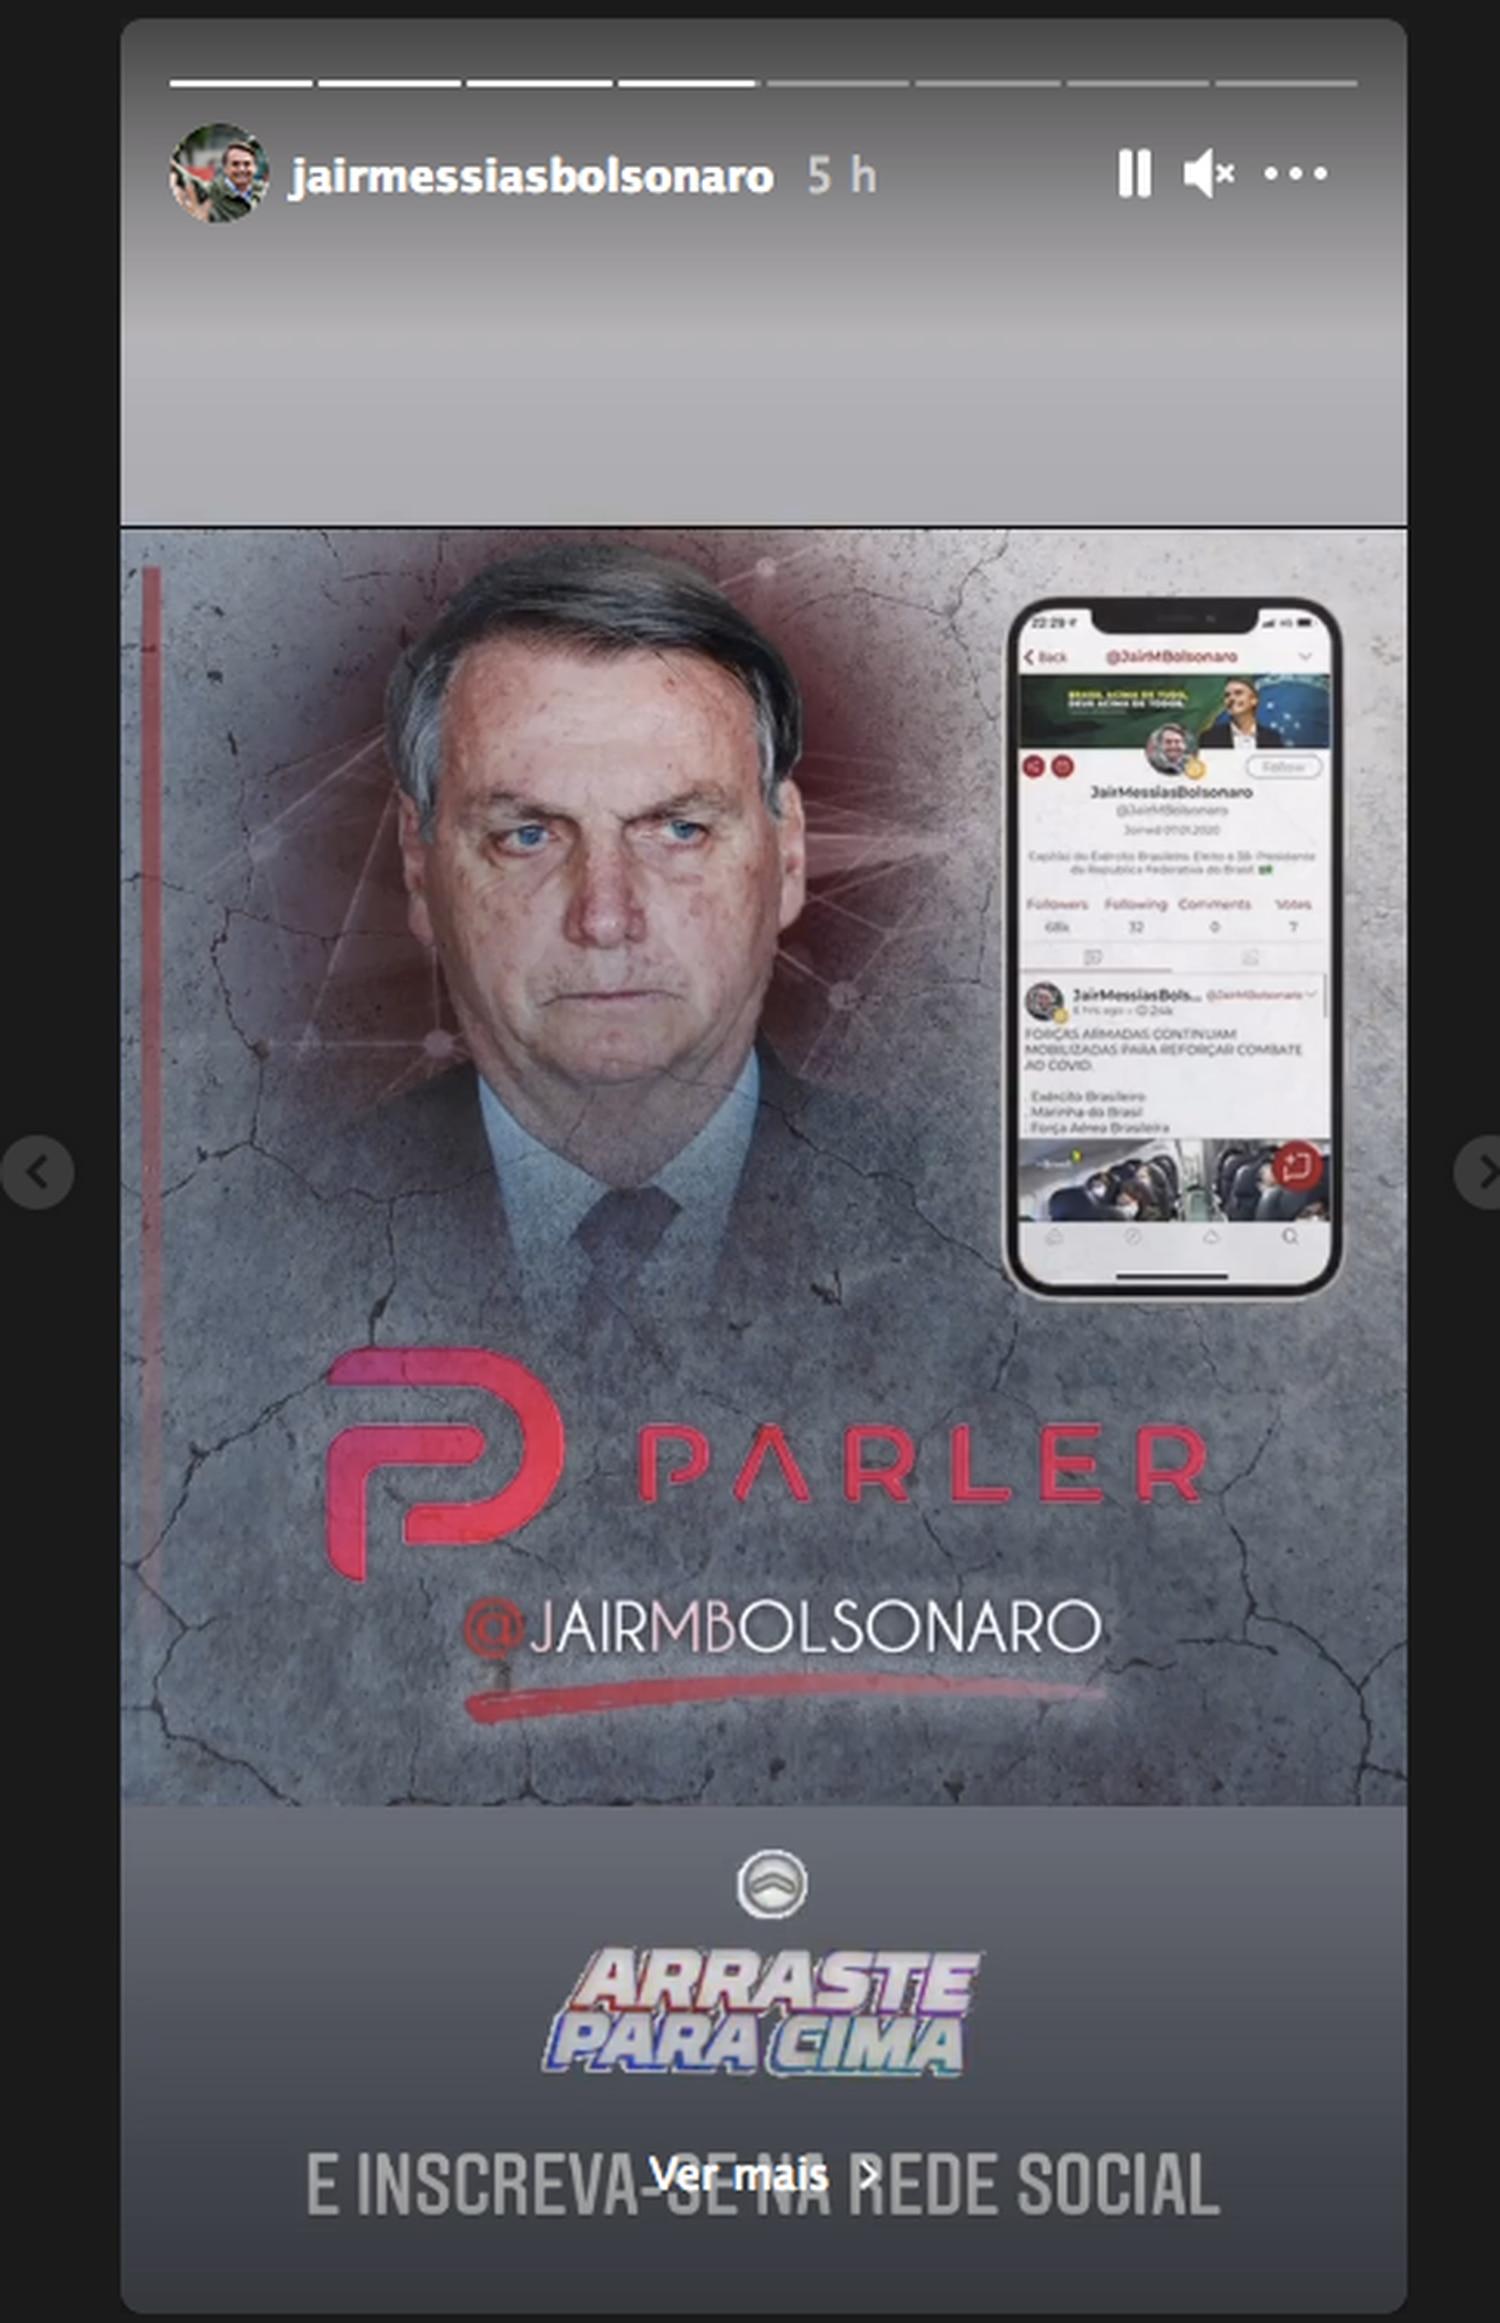 Bolsonaro convida apoiadores a segui-lo no Parler, suspenso pelo Google.